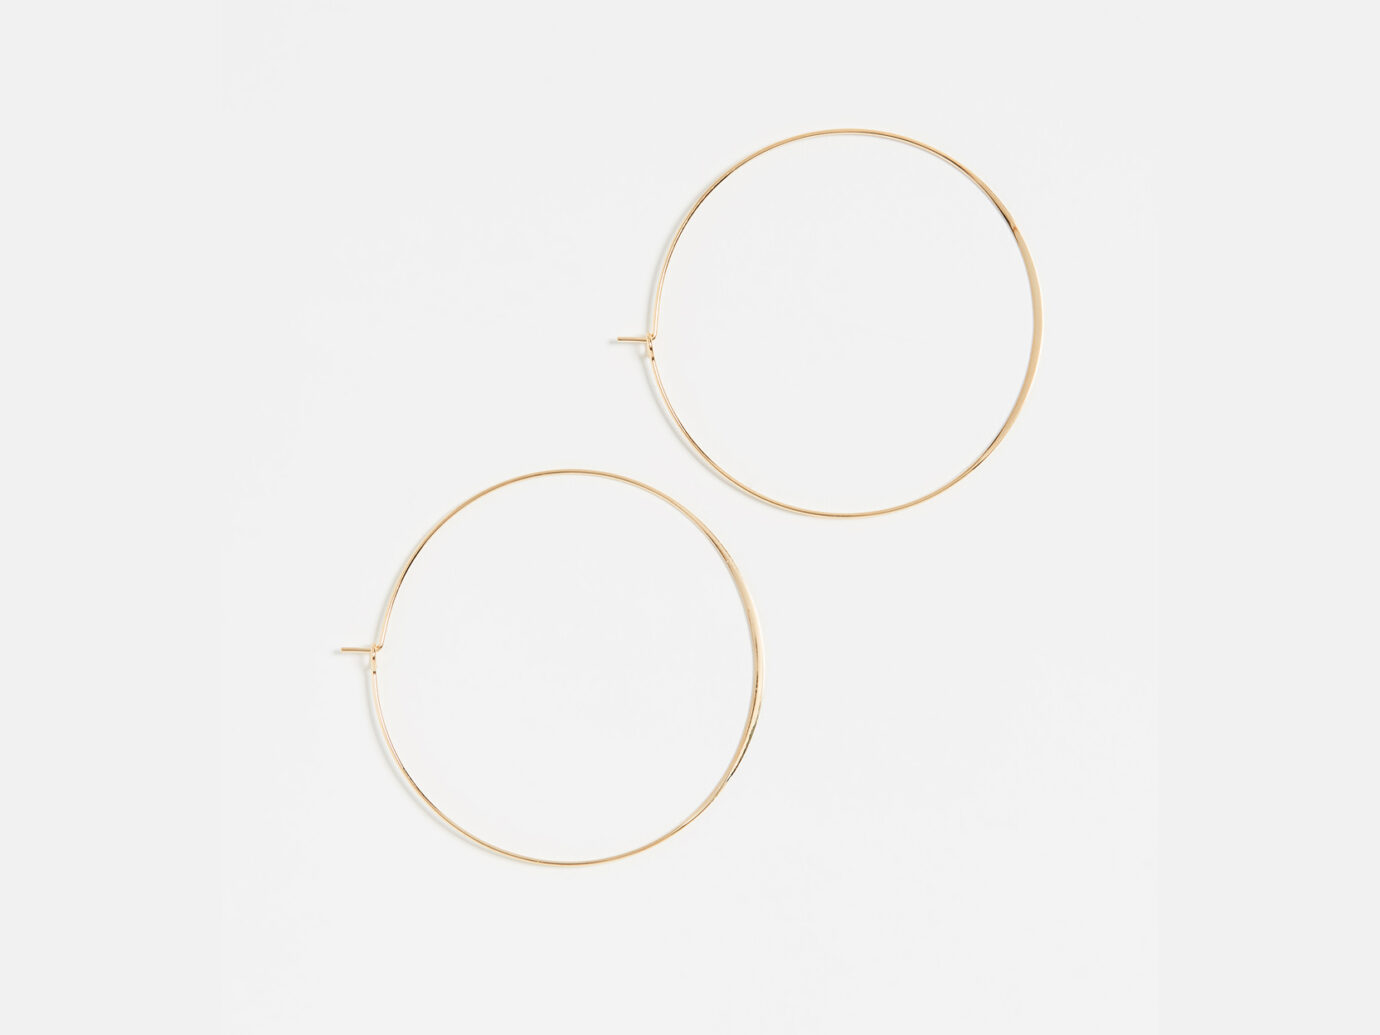 Jules Smith Suki Hoop Earrings